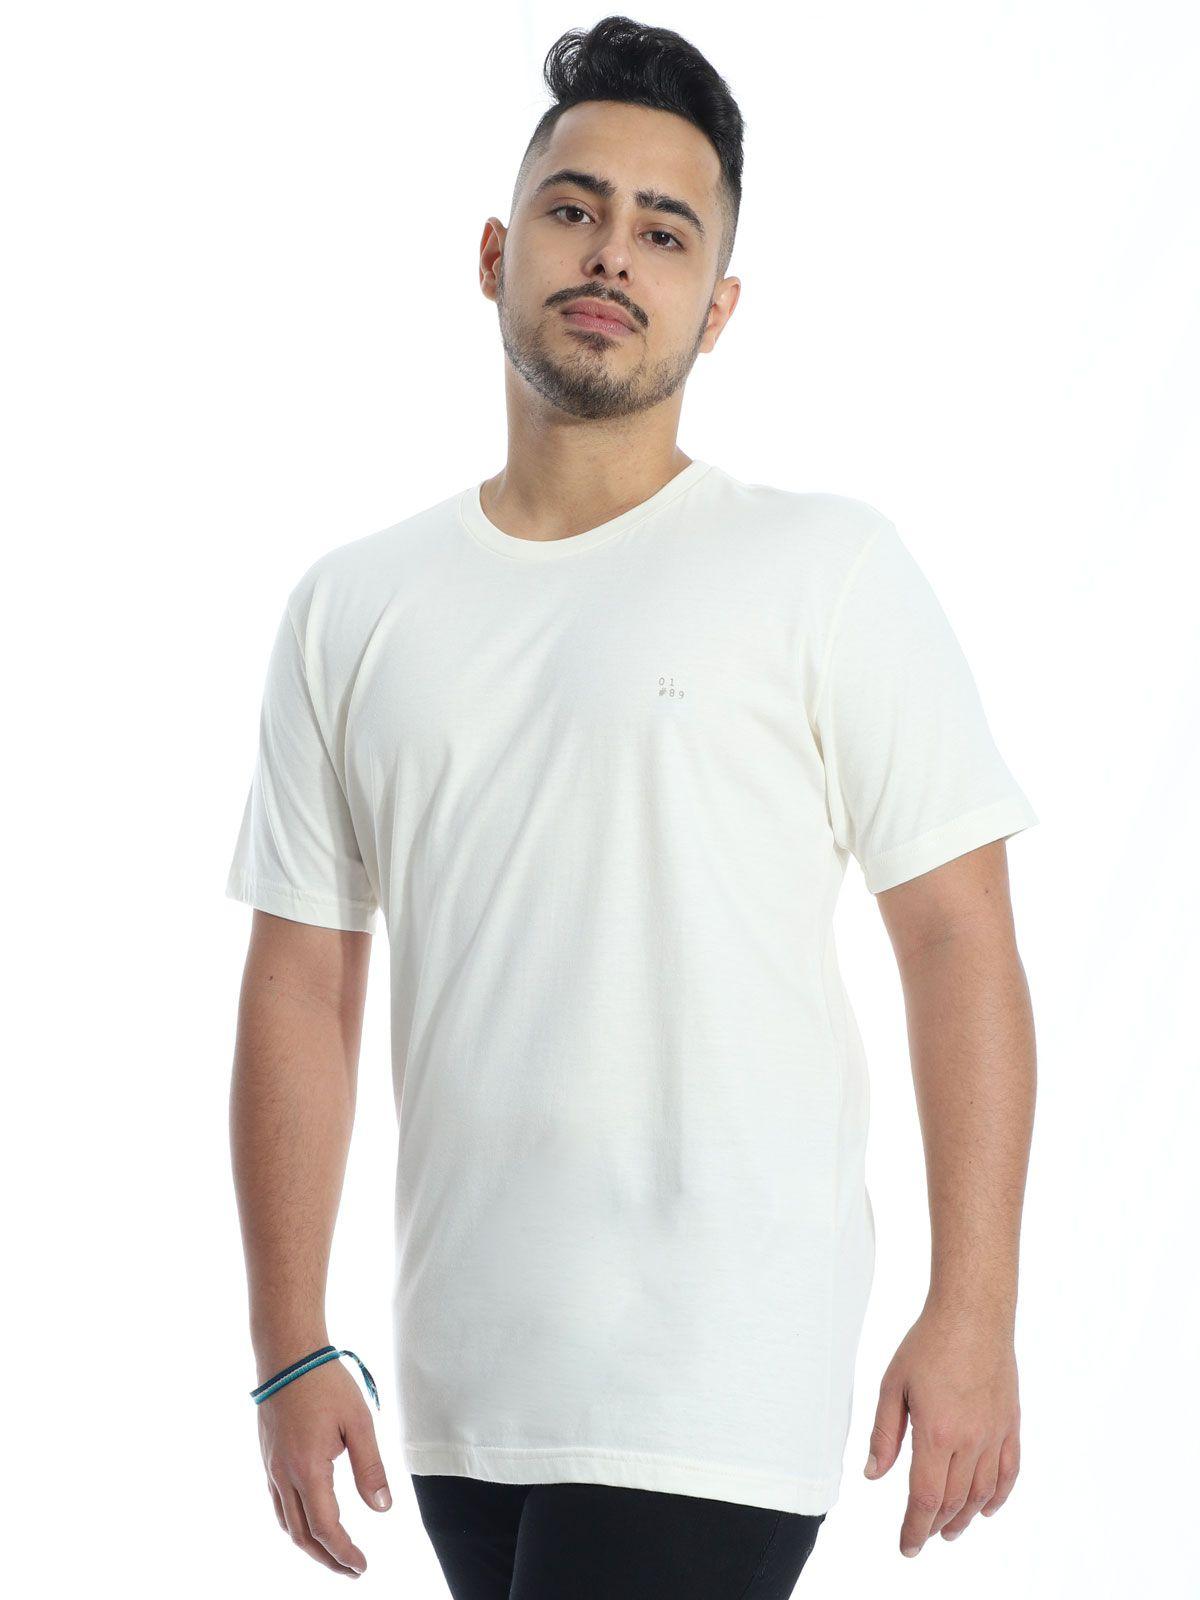 Camiseta Anistia #89 Marfim